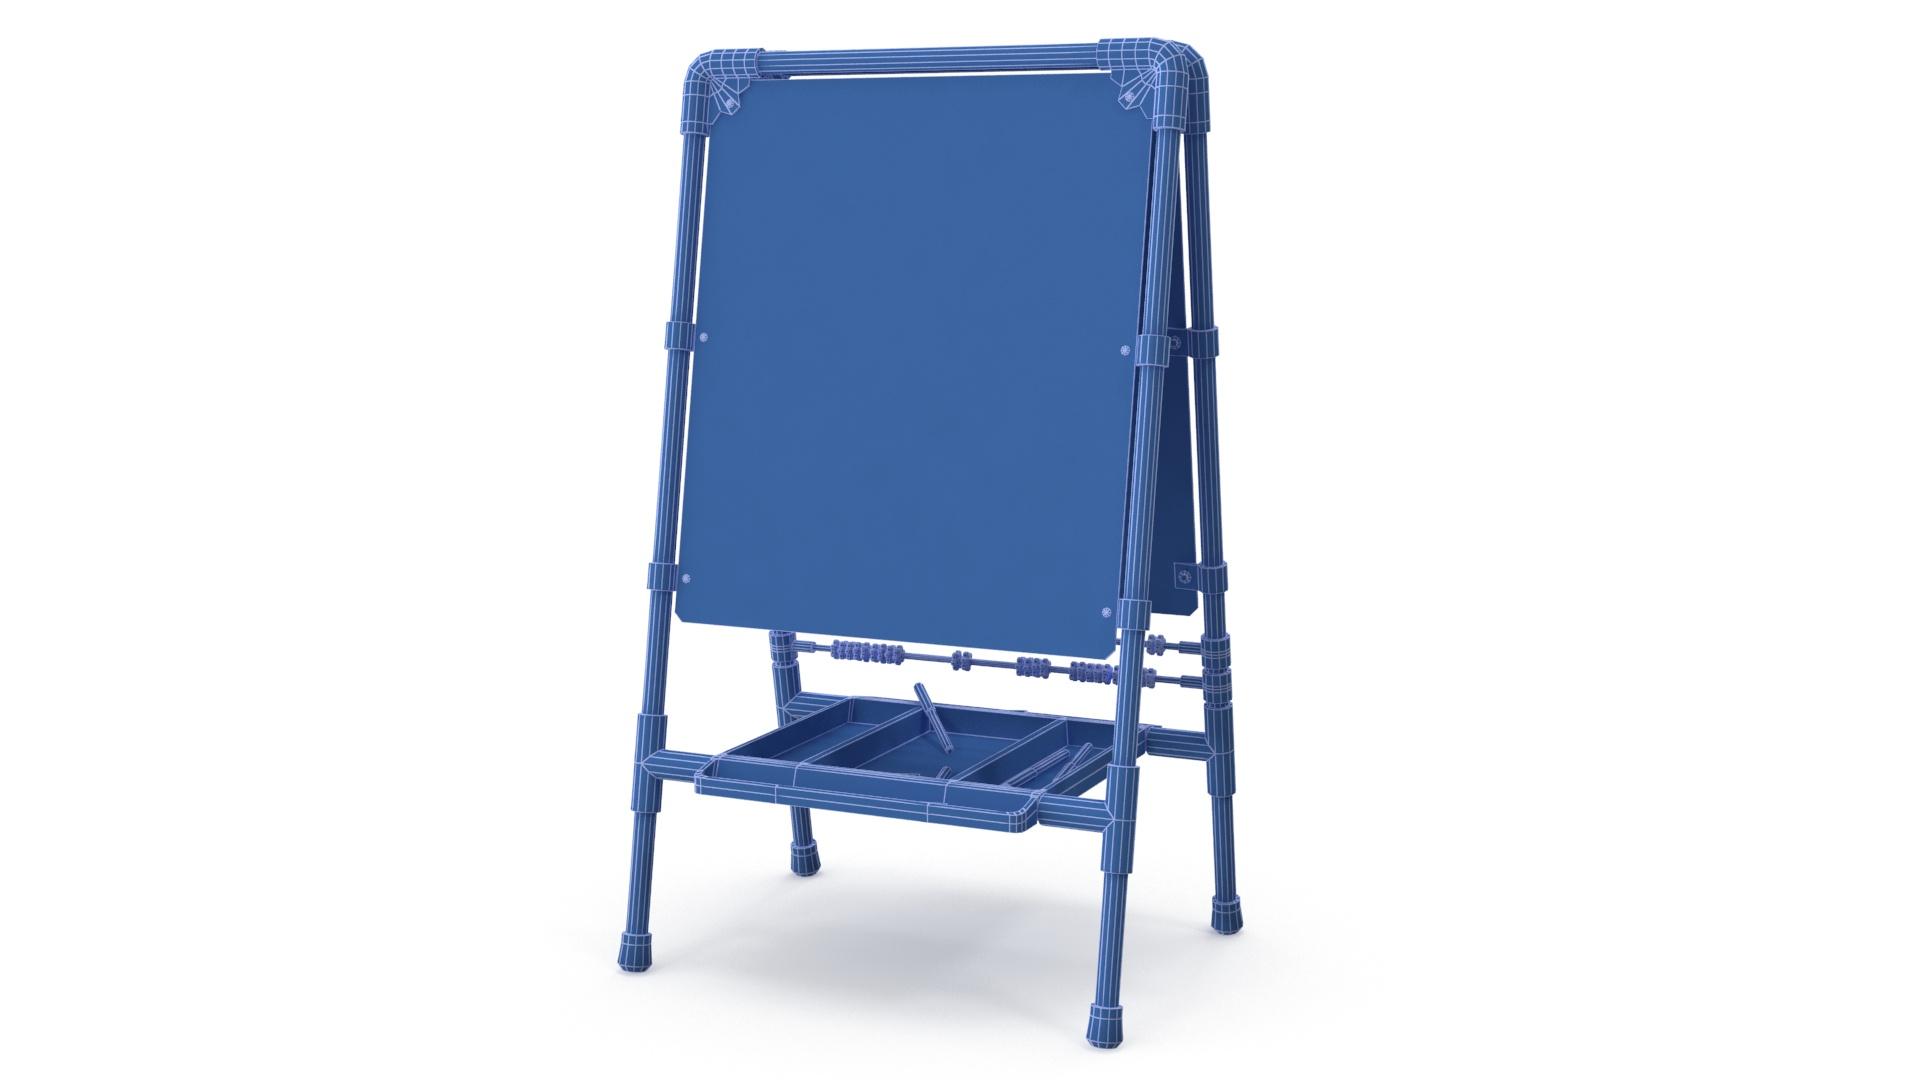 childrens drawing board 3d model 3ds max fbx obj 263608